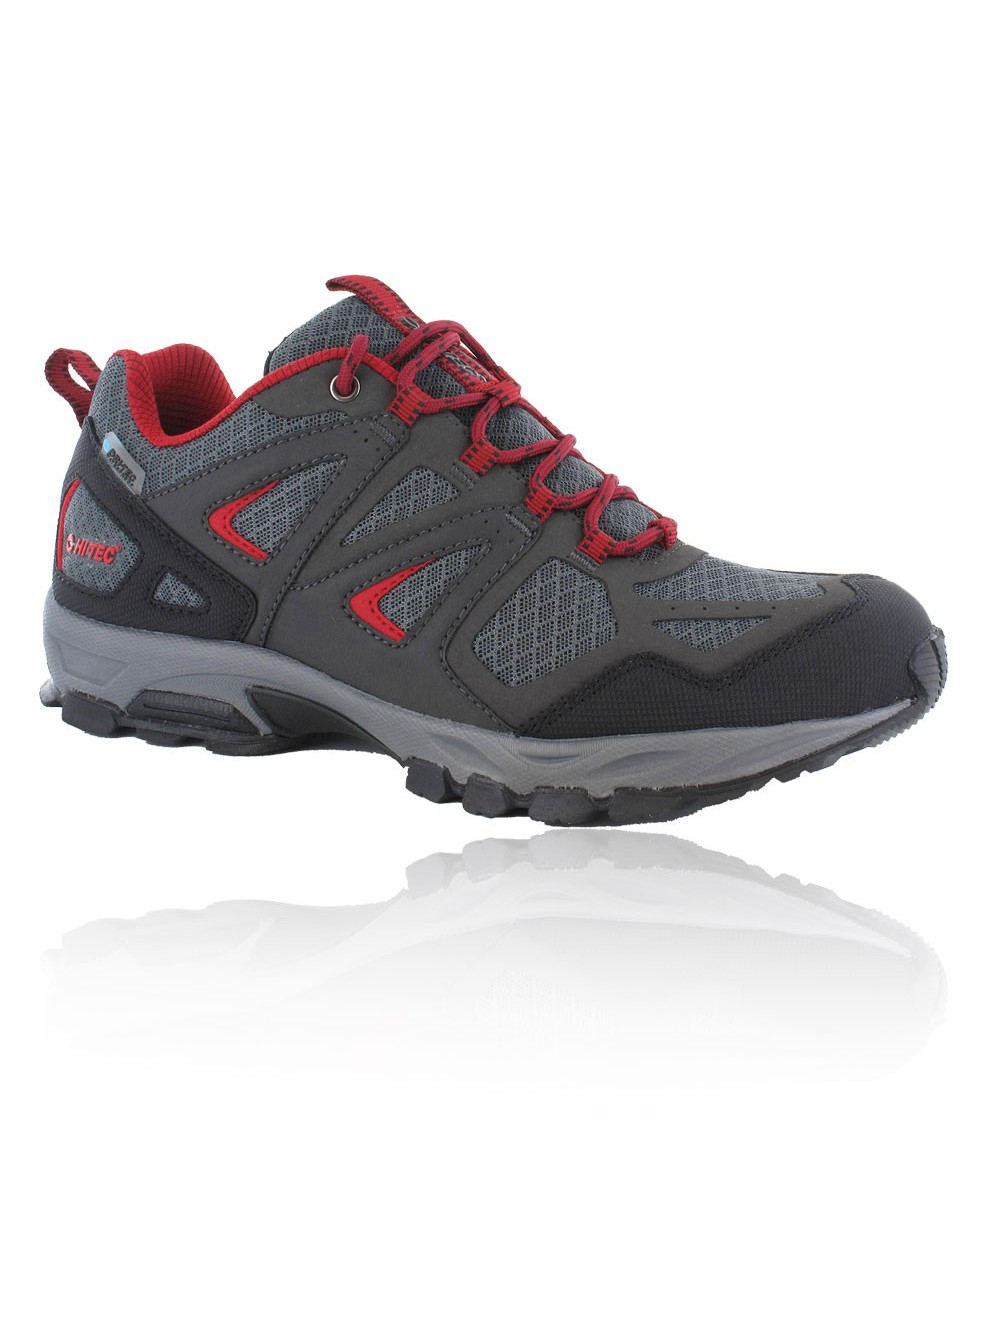 Трекінгові кросівки Hi-Tec Tundra ff24a3099734b